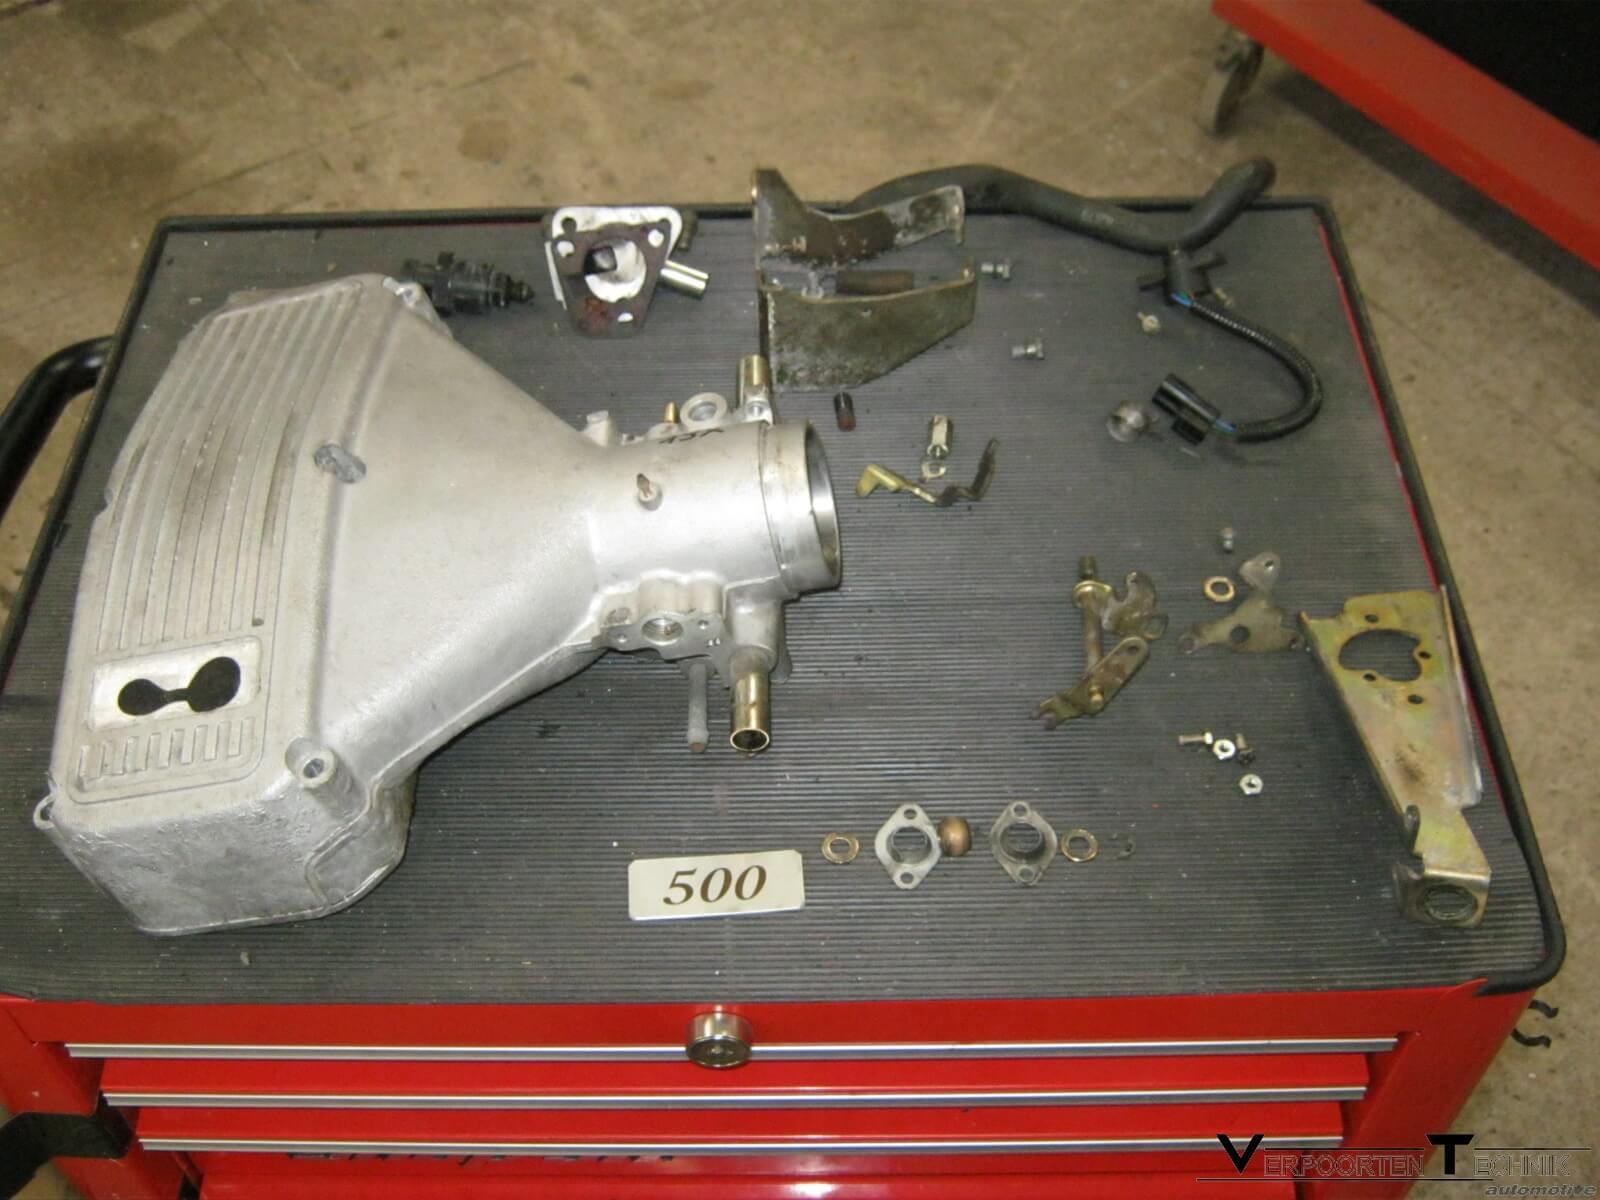 tvr chimaera griffith engine rebuild verpoorten technik automotive. Black Bedroom Furniture Sets. Home Design Ideas